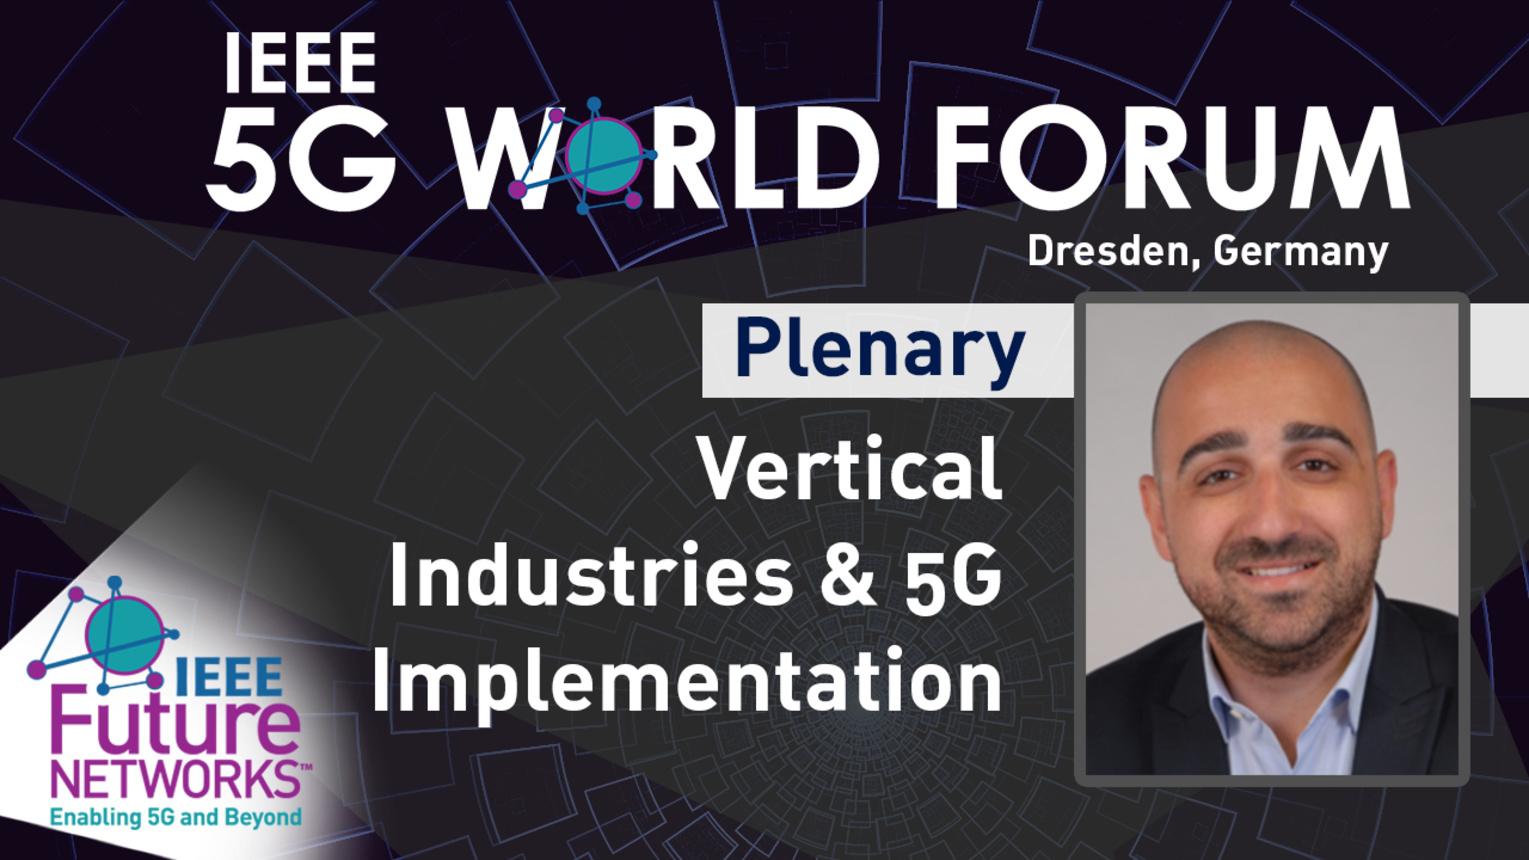 Vertical Industries & 5G Implementation - Fouad El Mernissi - 5G World Forum Dresden, 2019